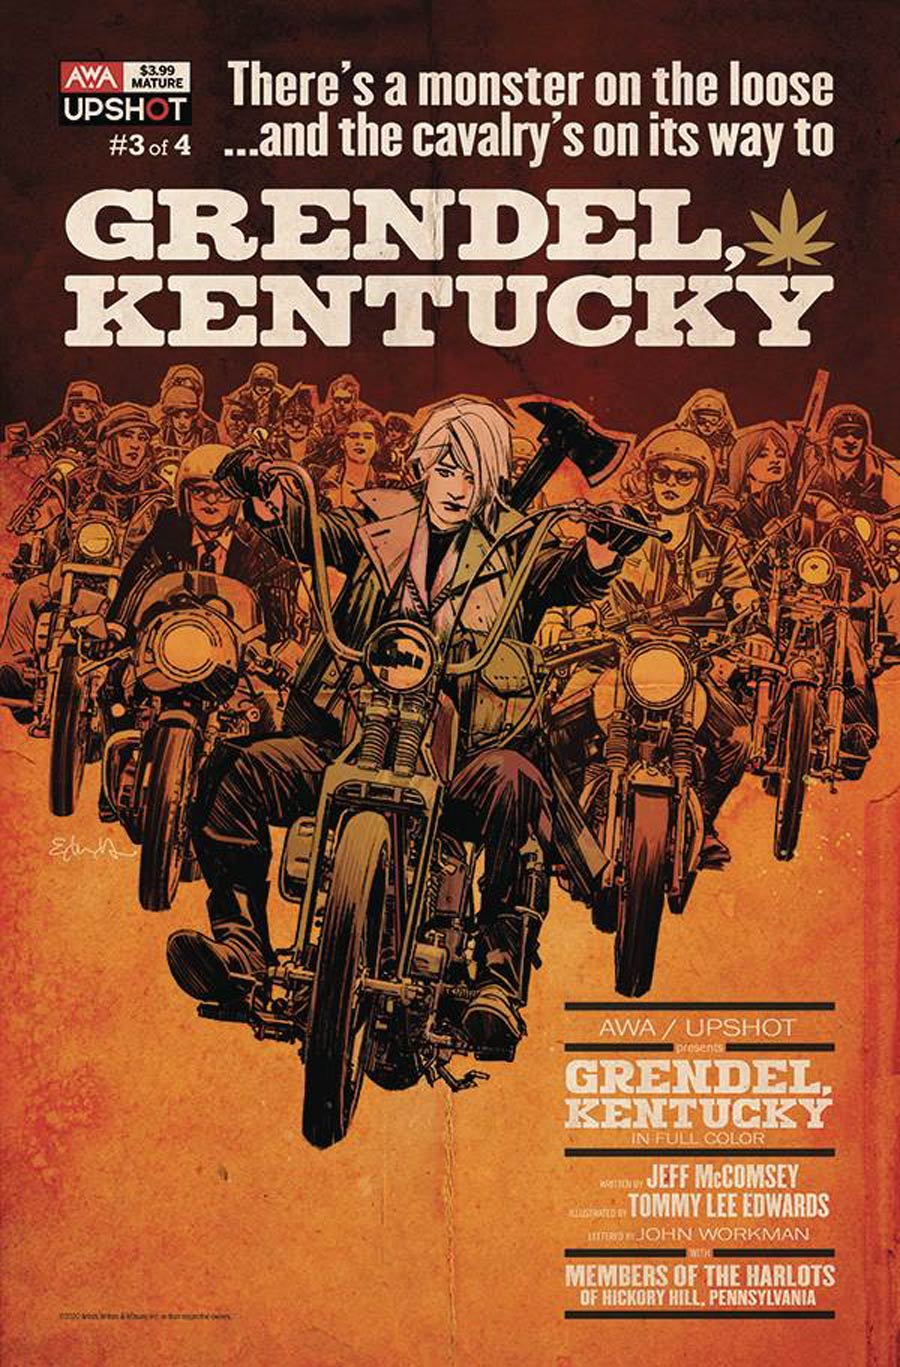 Grendel Kentucky #3